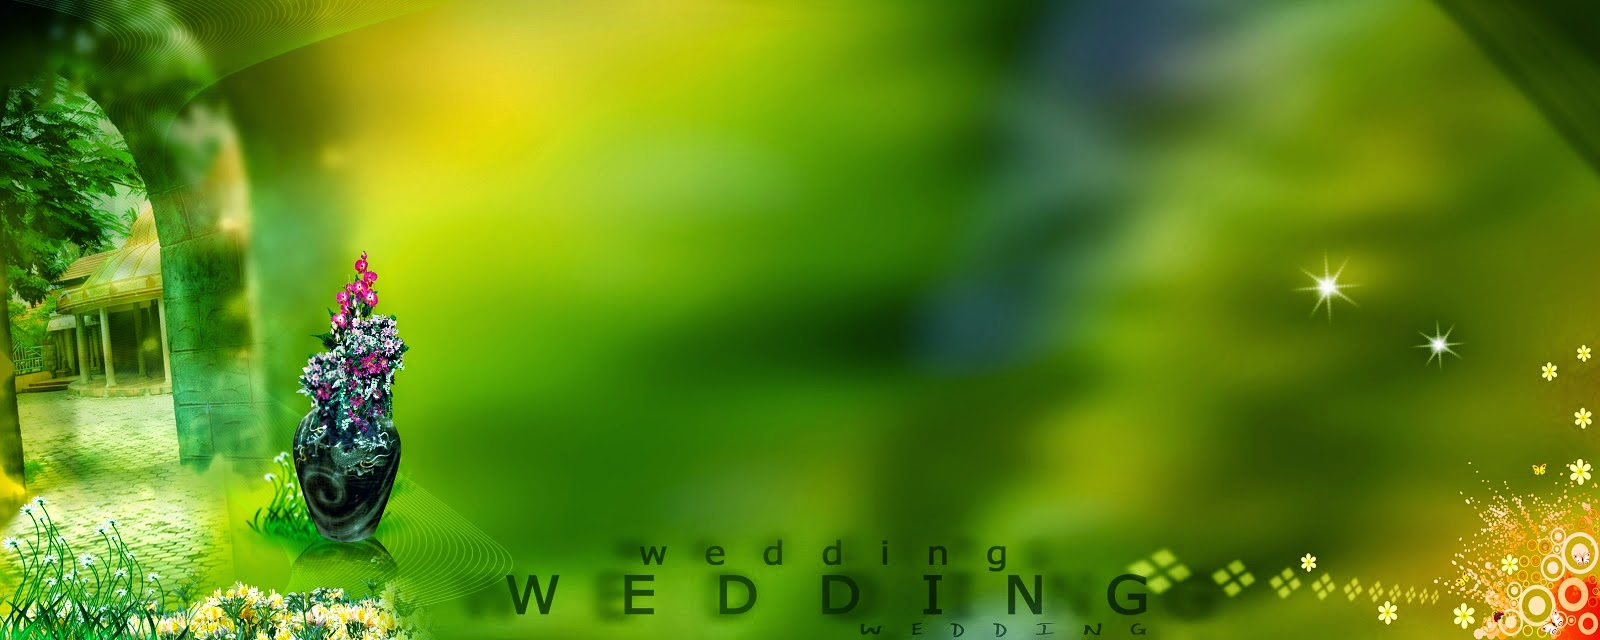 Karizma Album Background 12x18 Joy Studio Design Gallery